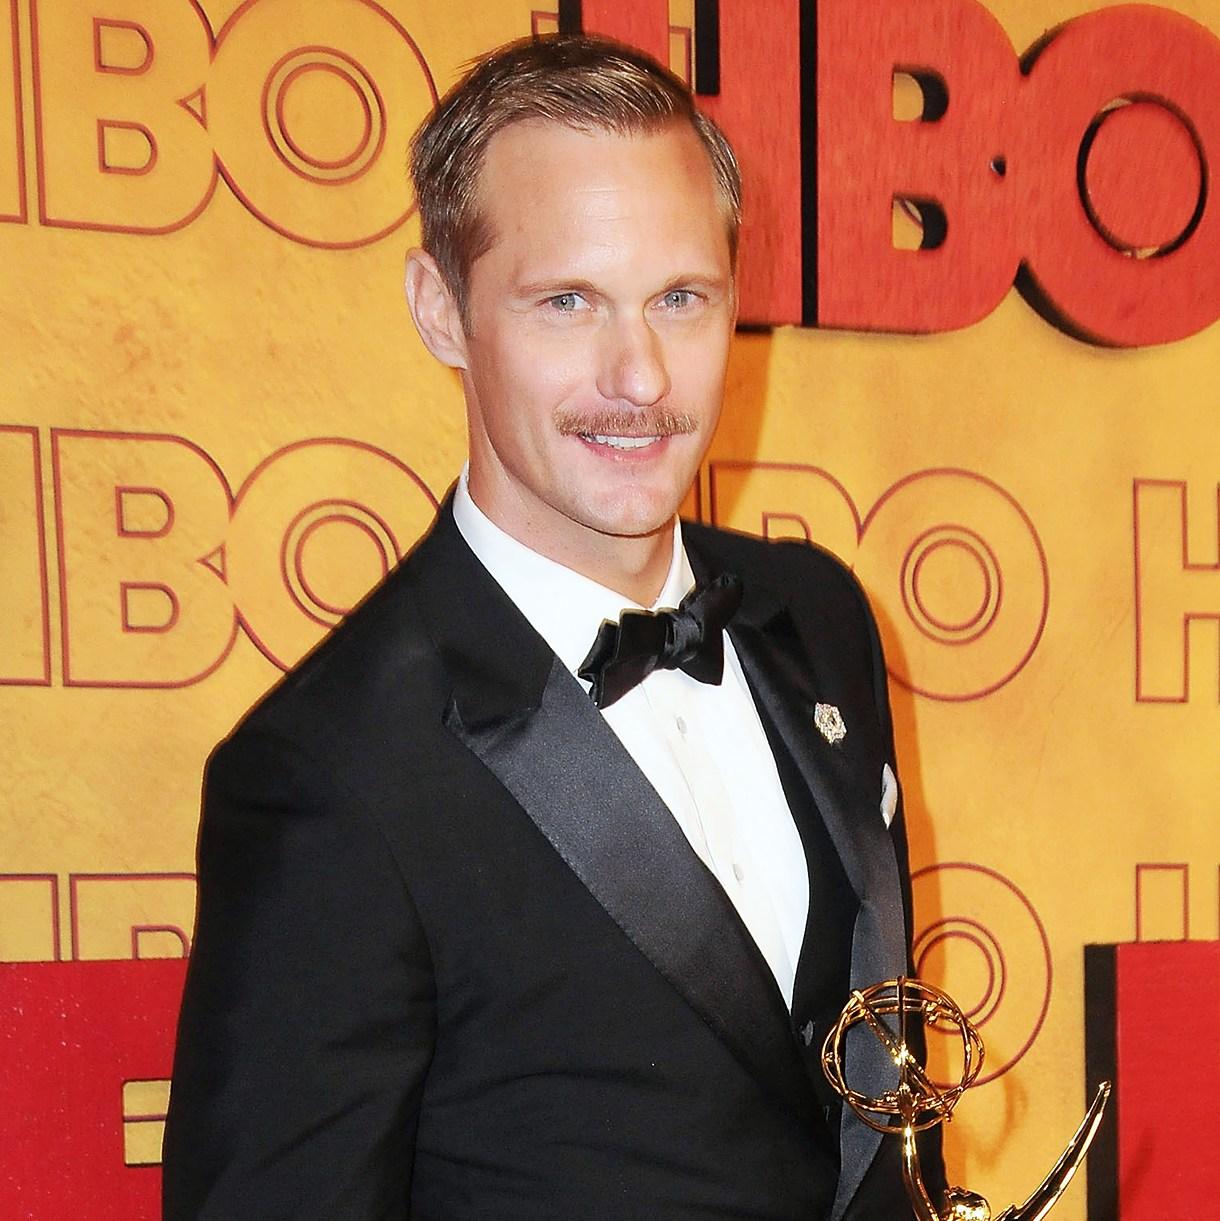 Alexander Skarsgard haircut Emmy Awards mustache